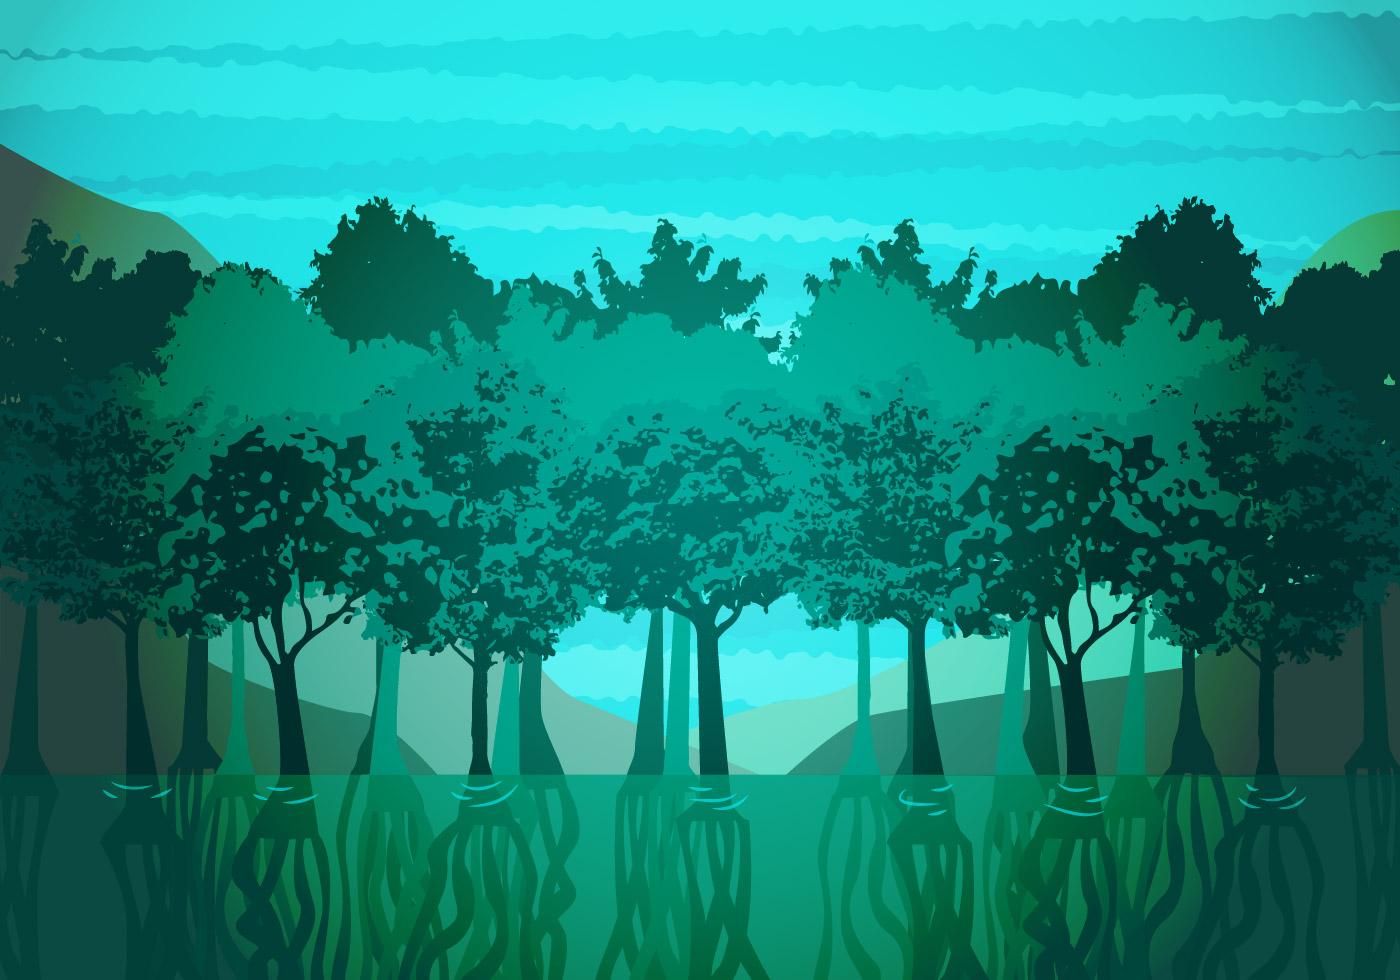 Mangrove Illustration Vector Download Free Vector Art